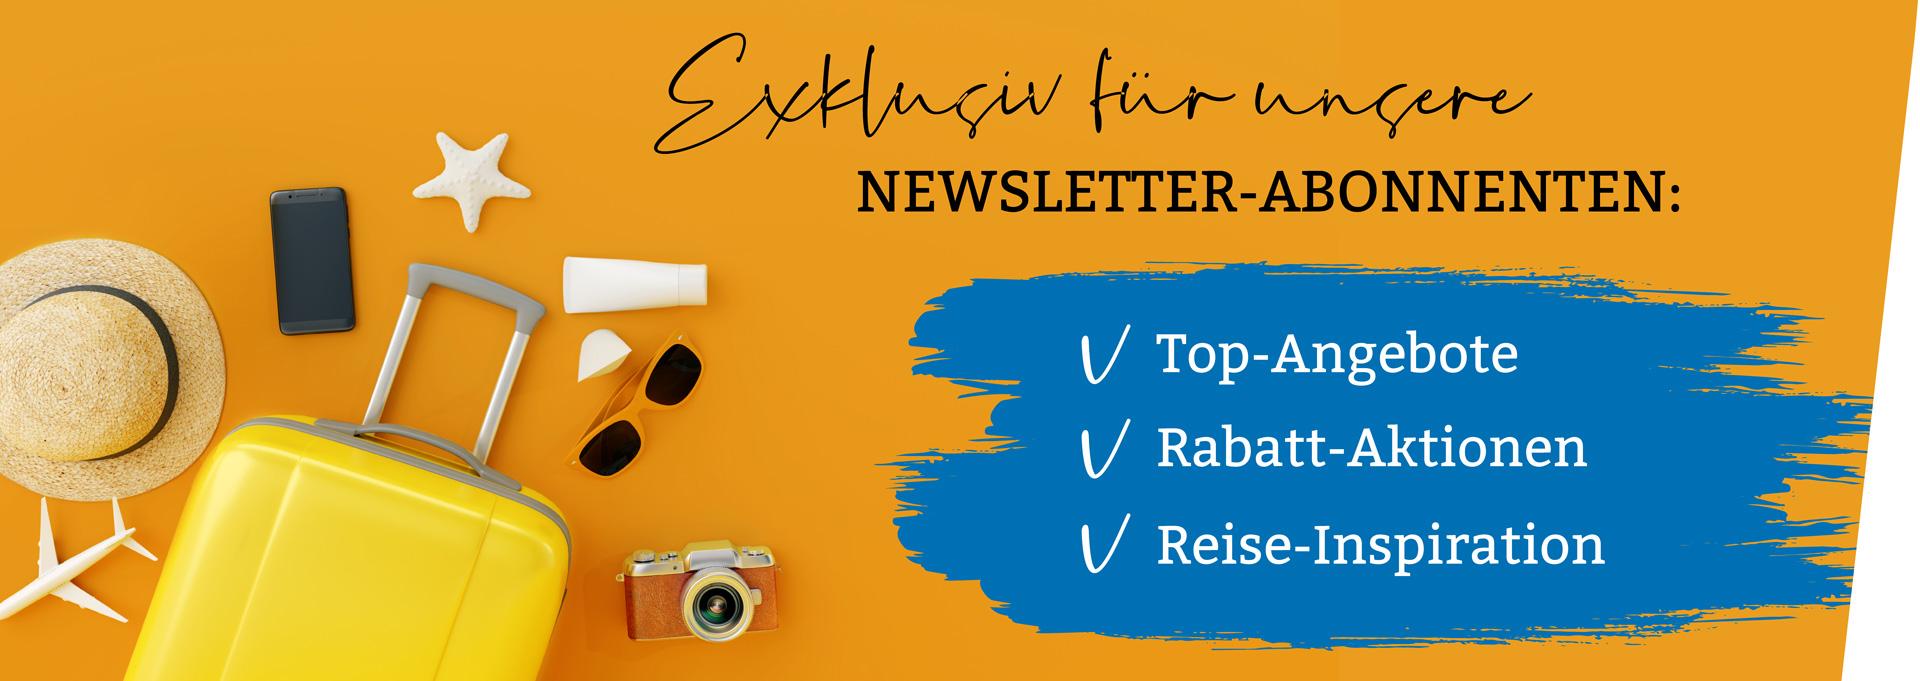 Stanglmeier Newsletter Anmeldung